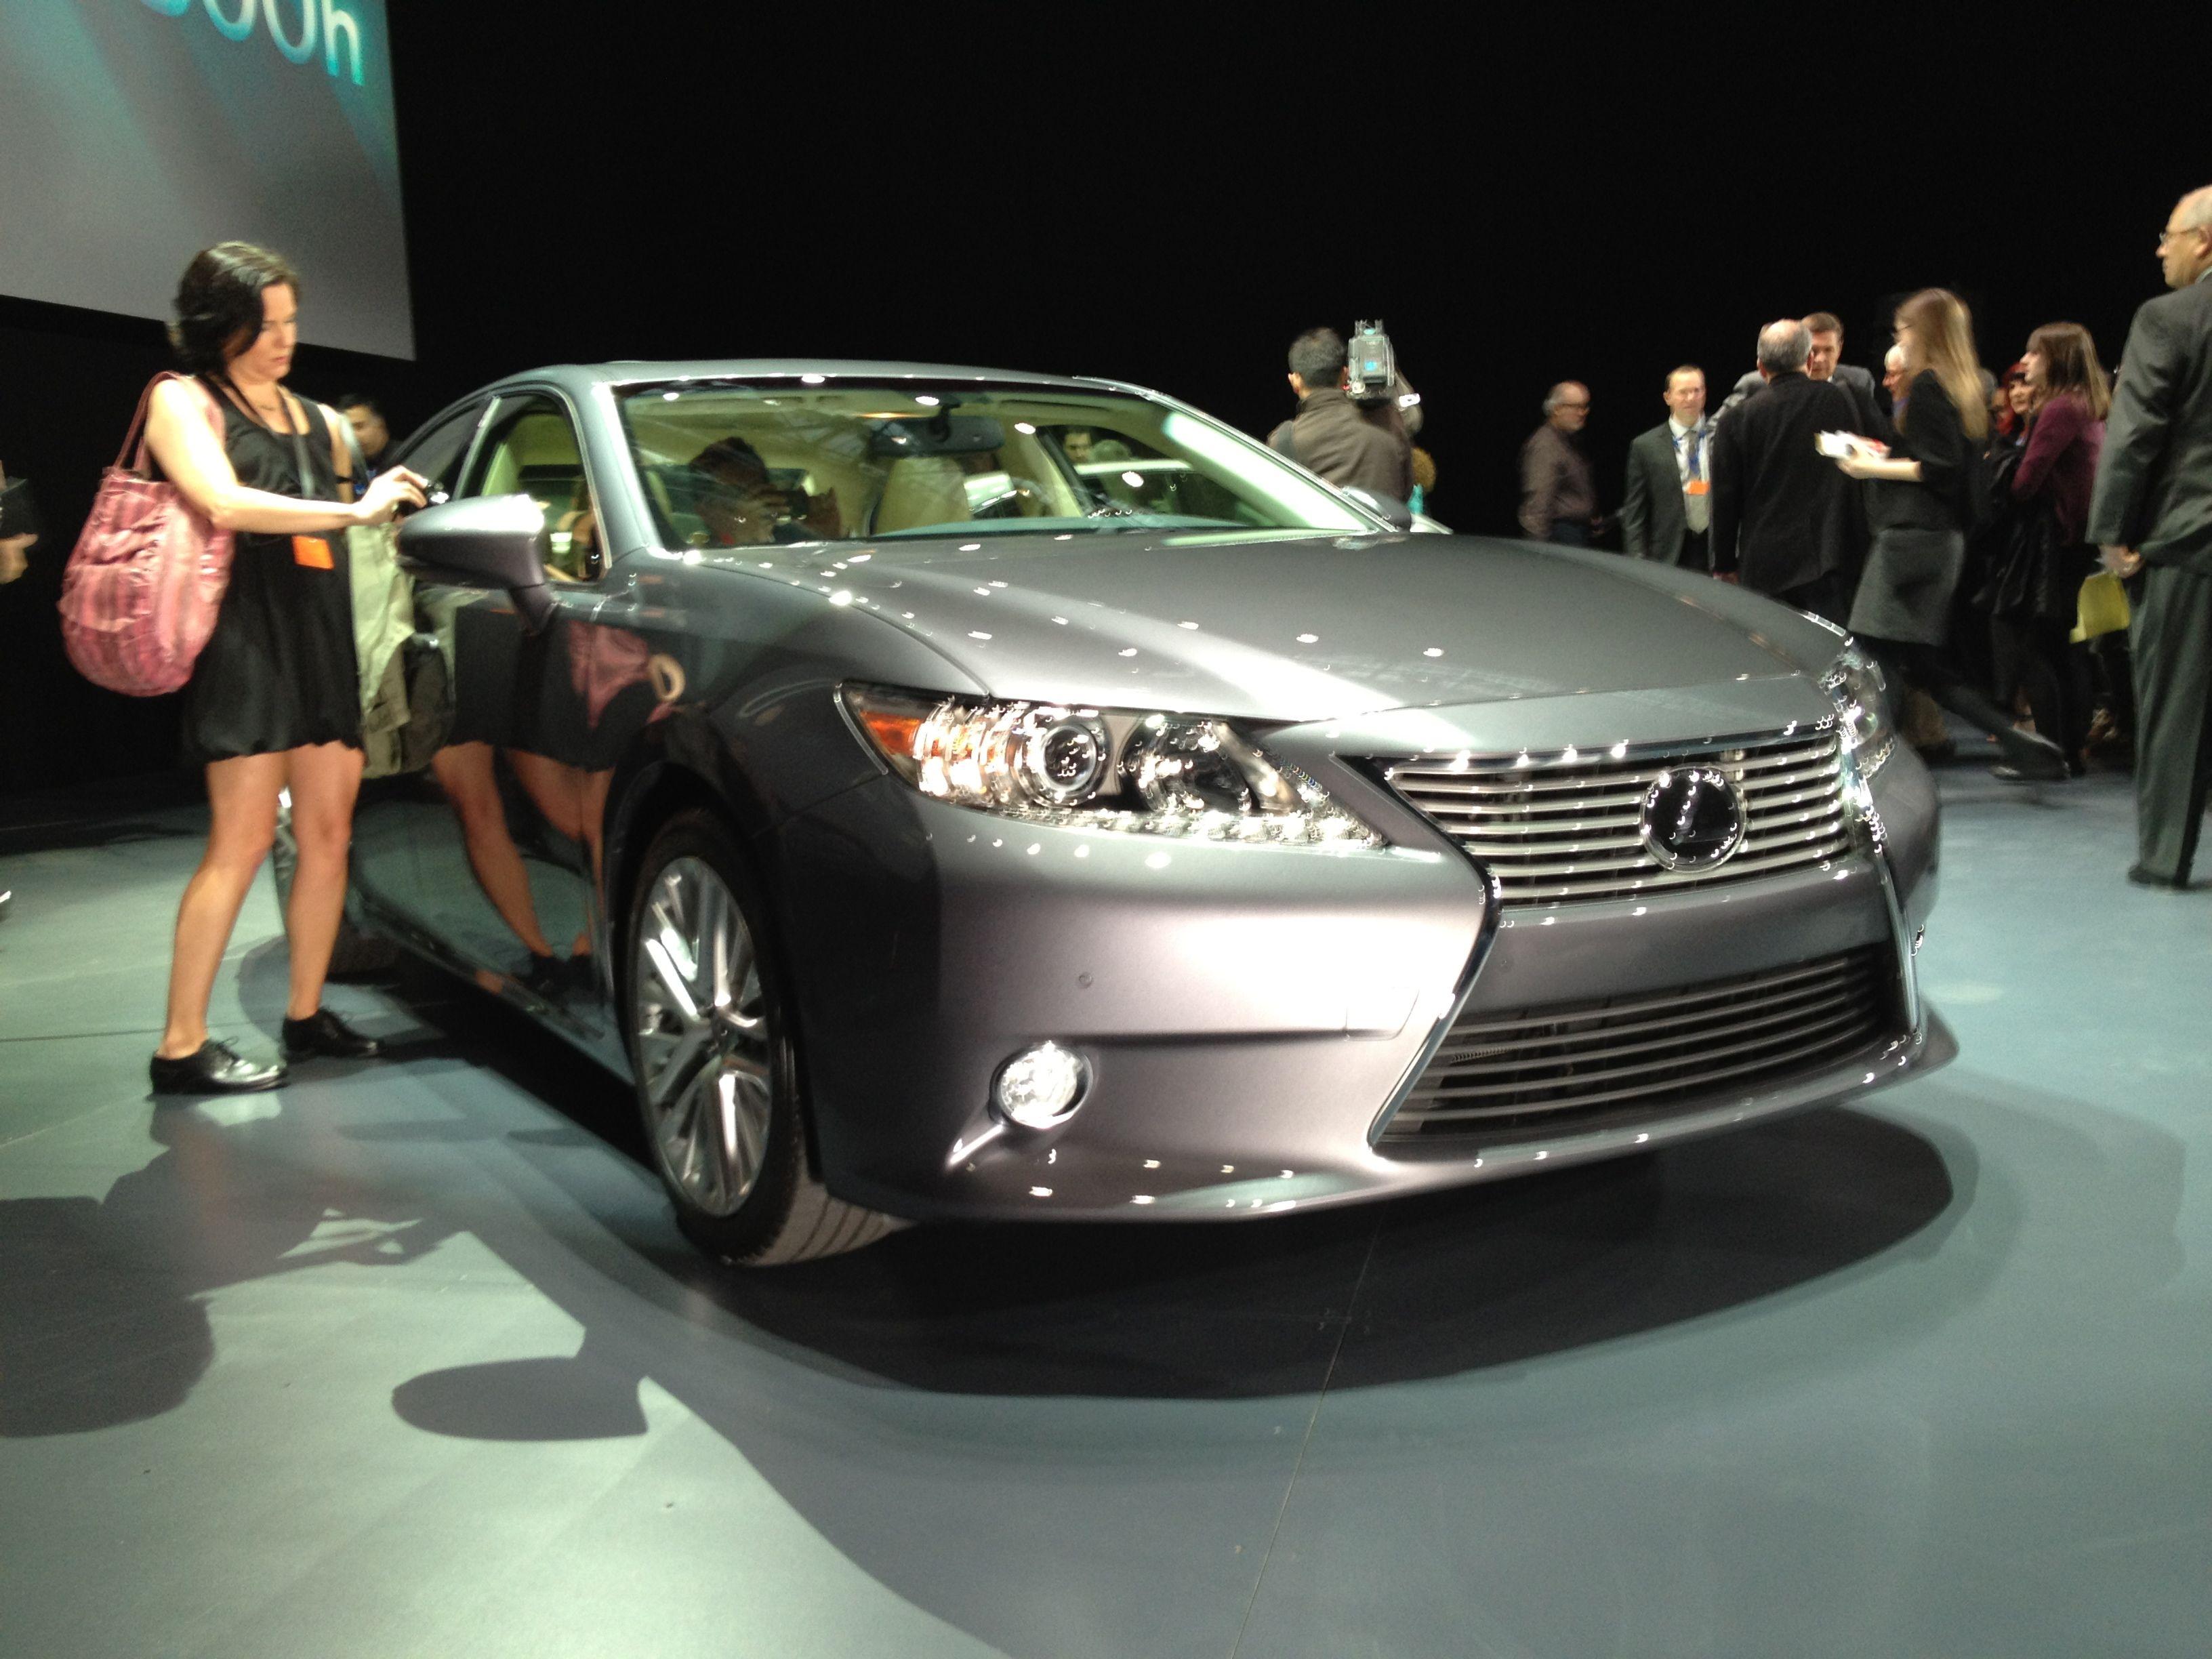 File Lexus ES300h at the 2012 New York International Auto Show